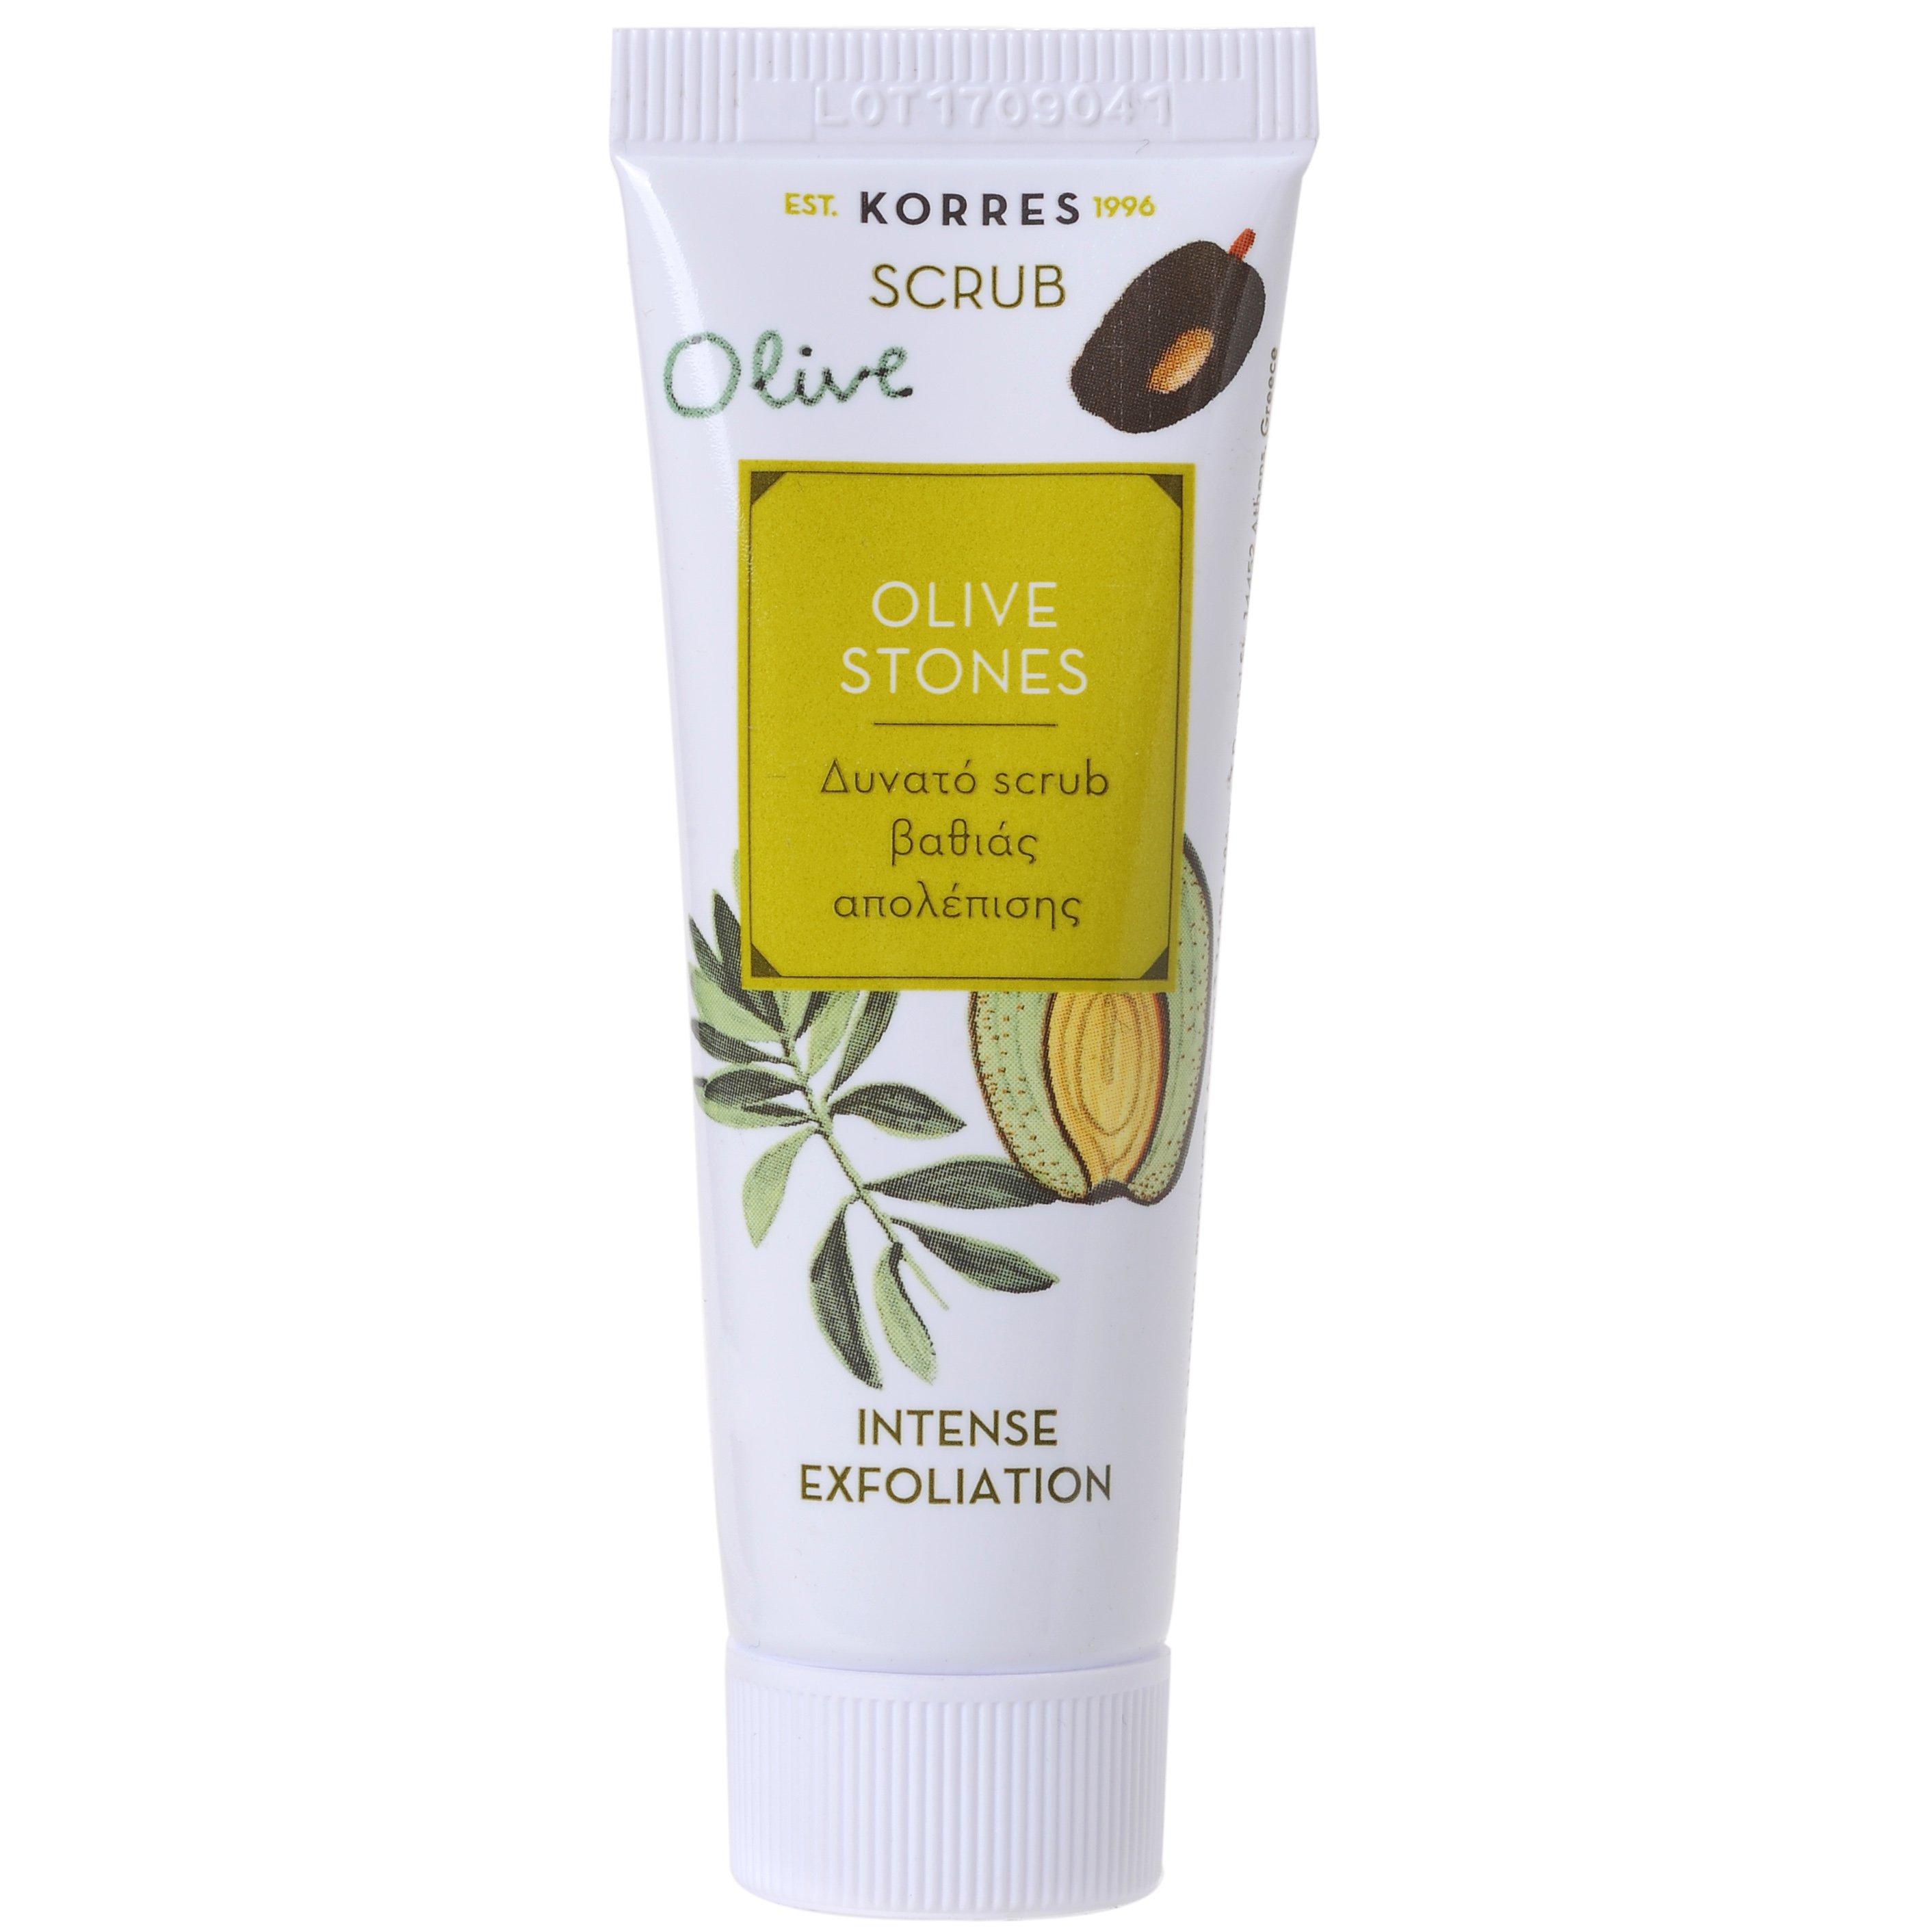 Korres Scrub Olive Stones Δυνατό Scrub Βαθιάς Απολέπισης για Βαθύ Καθαρισμό 18ml